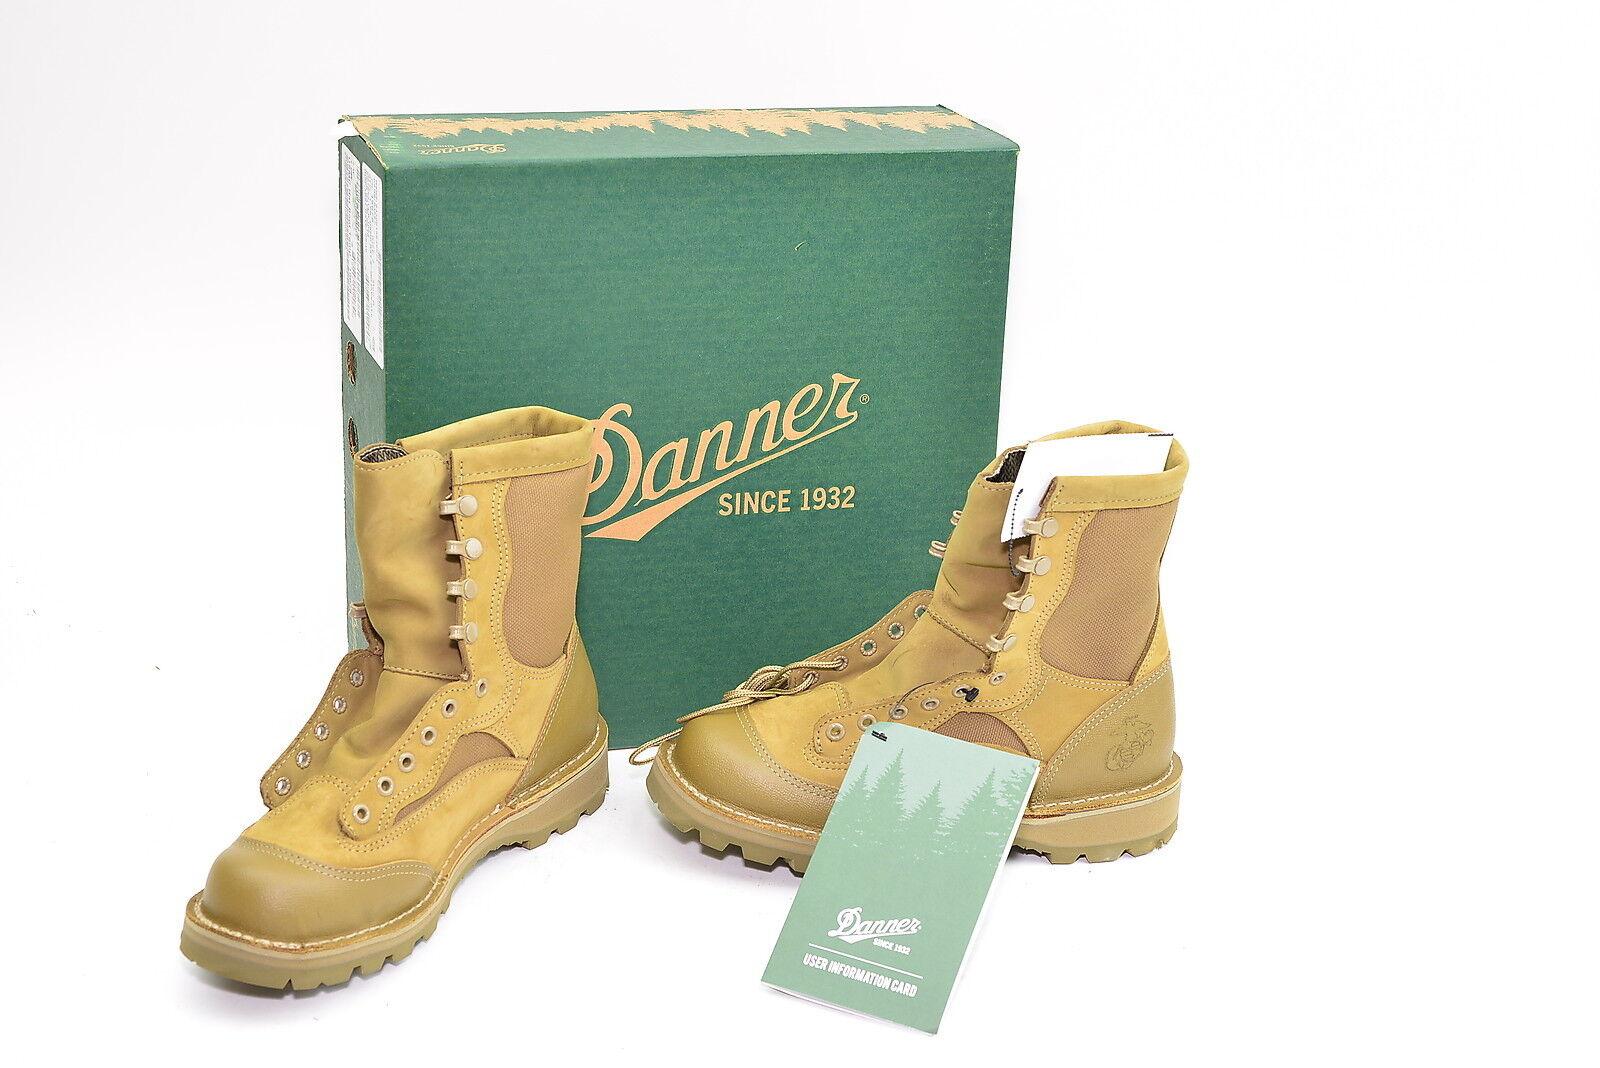 Danner USMC Rat MOJAVE  GTX  boots   Size 7.5  R     #15678   GORE-TEX  .